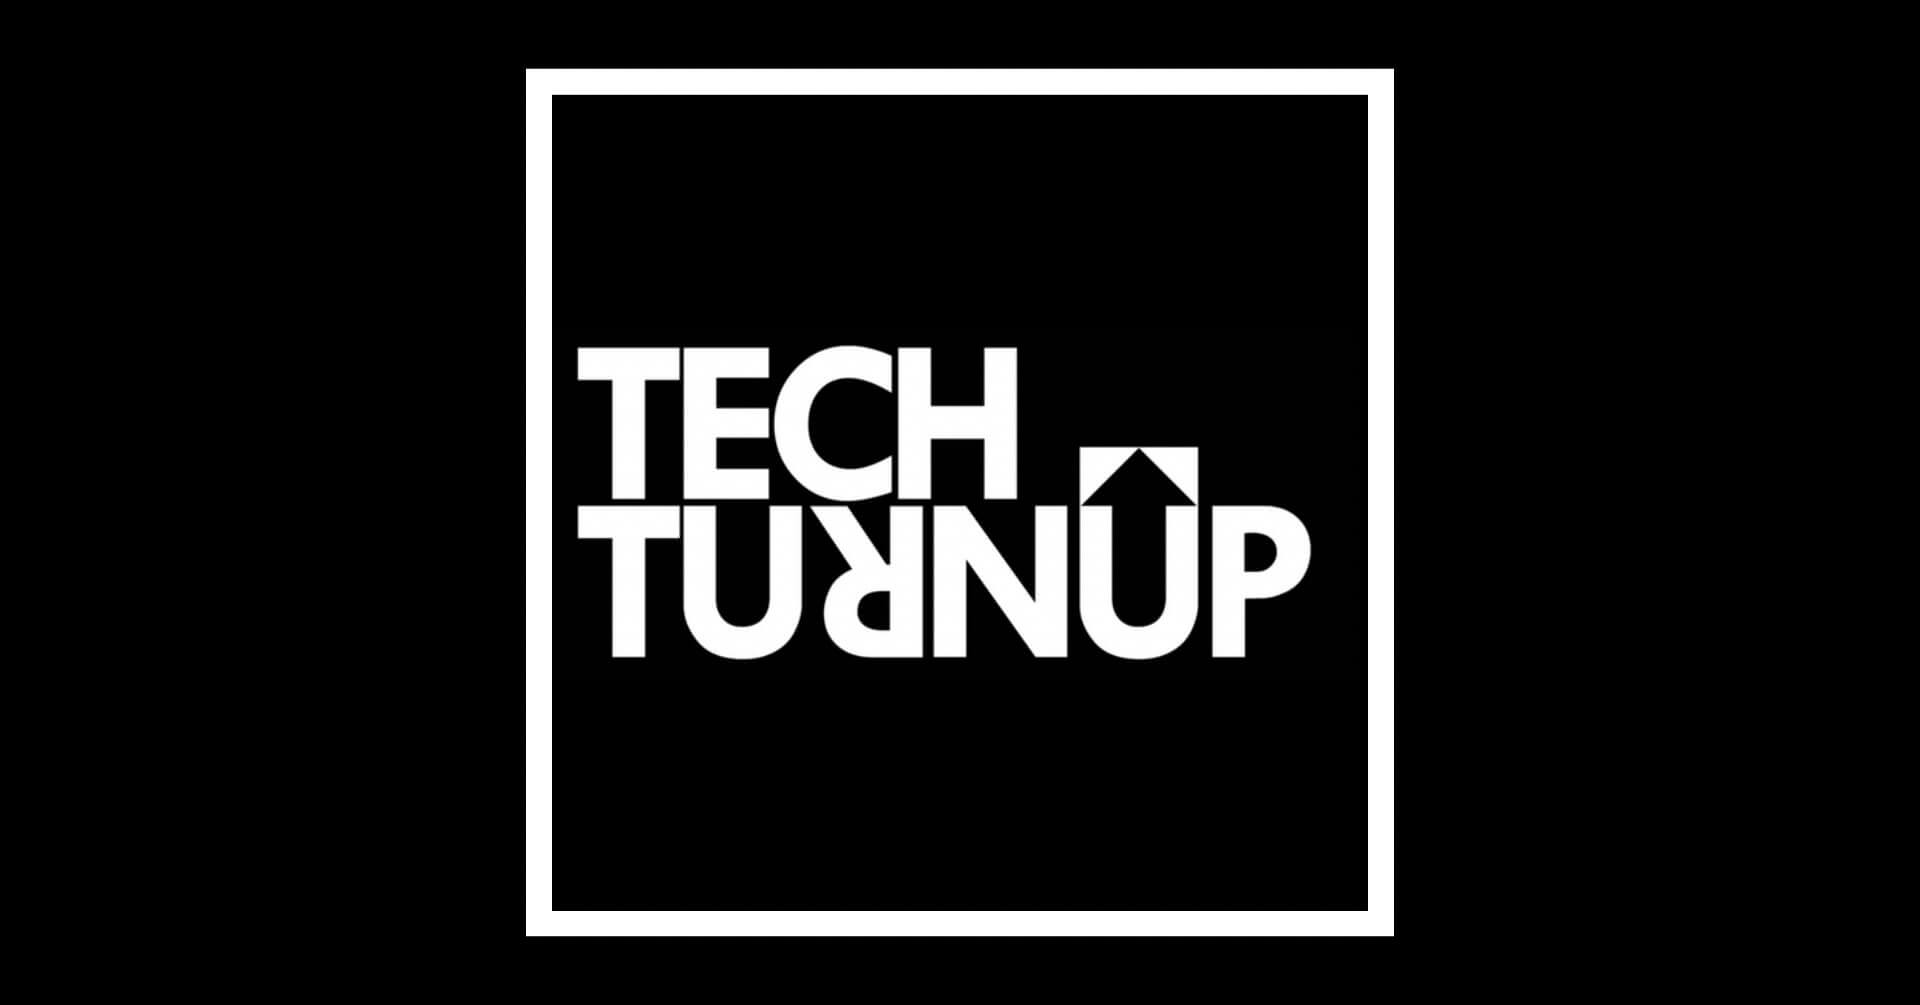 Tech Turn Up